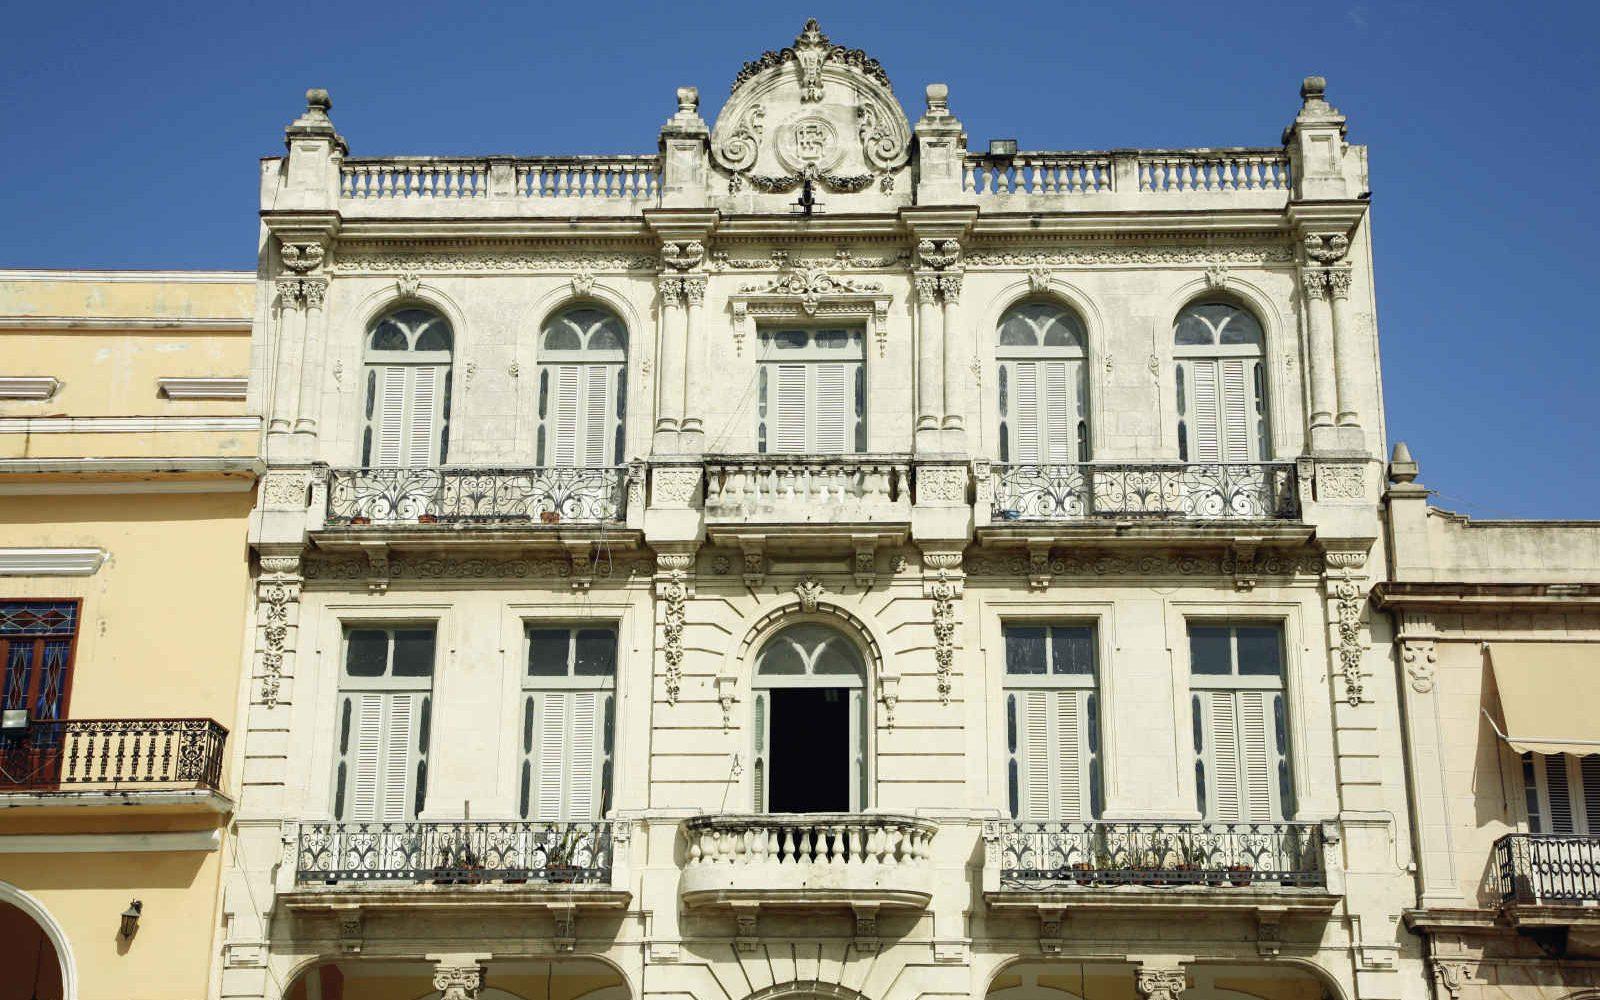 Colonial building in Havana, Cuba